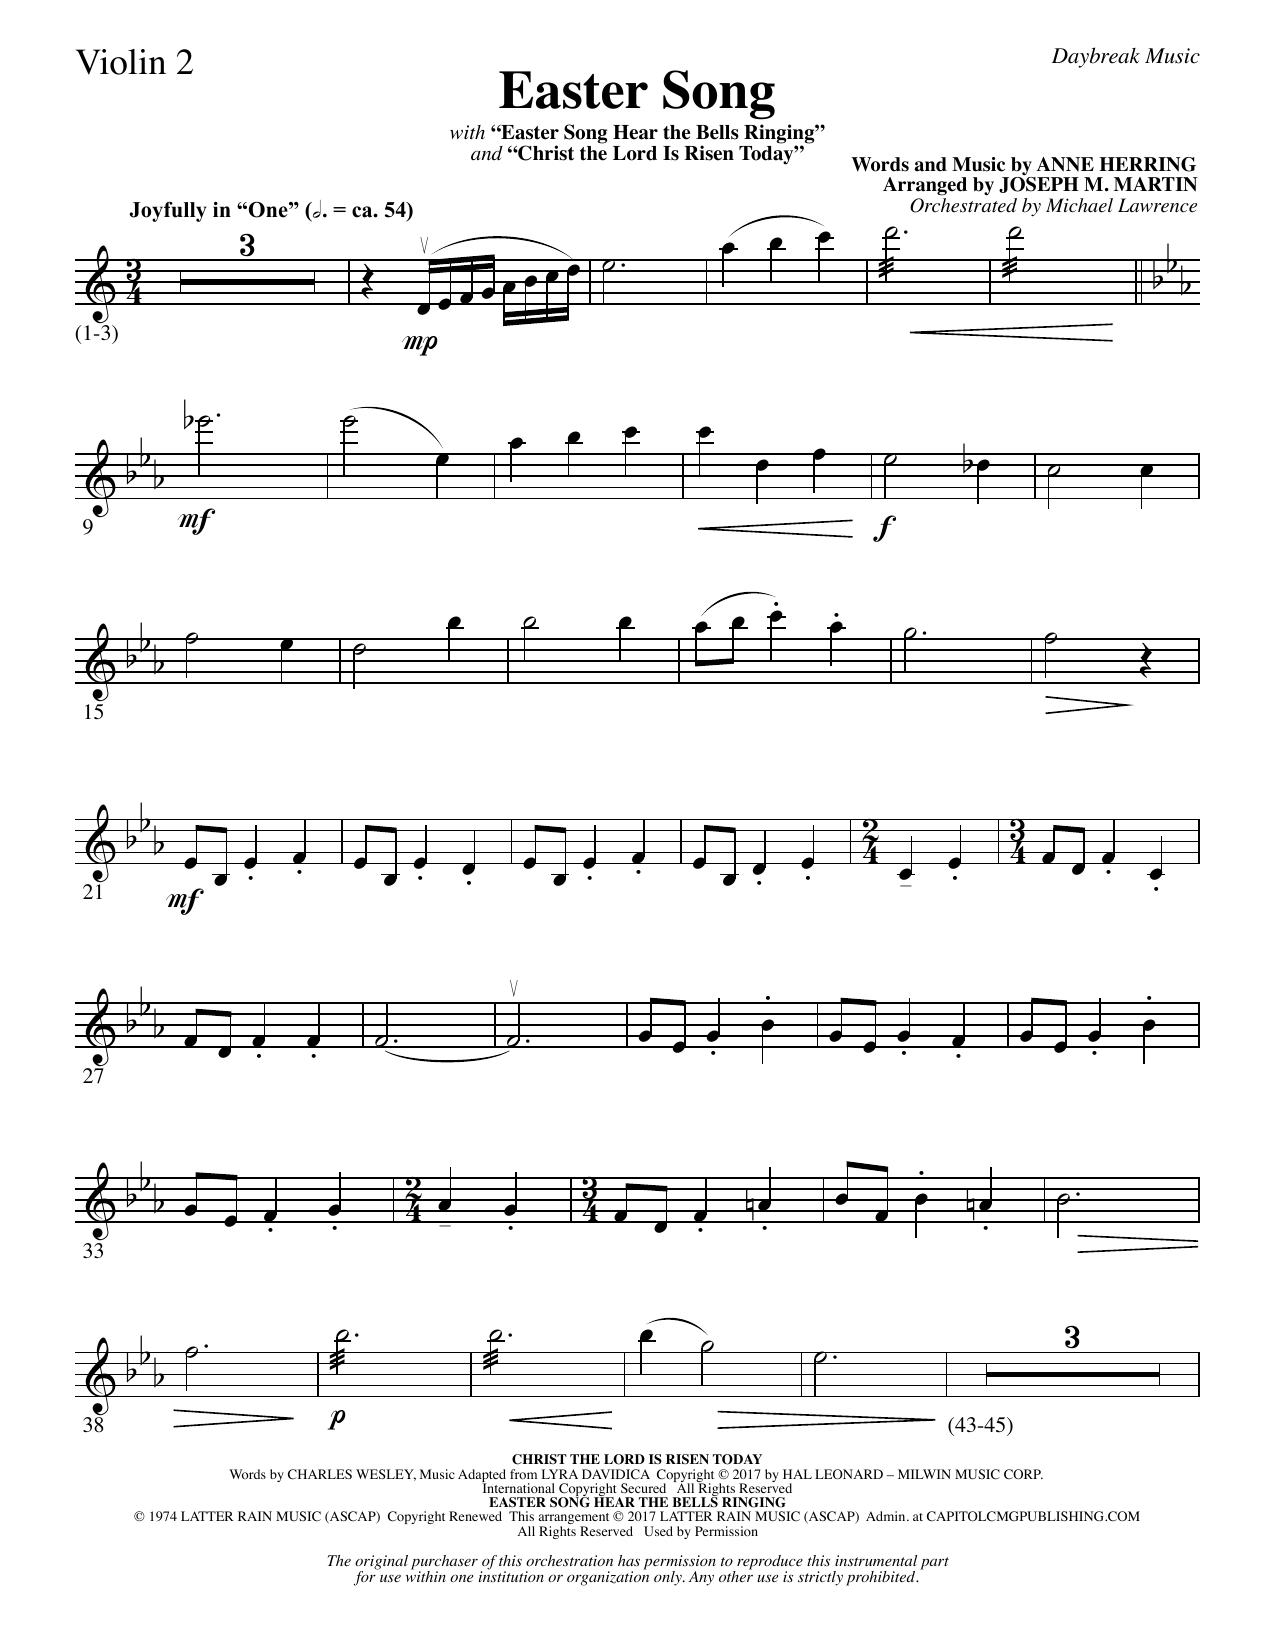 Easter Song - Violin 2 Sheet Music